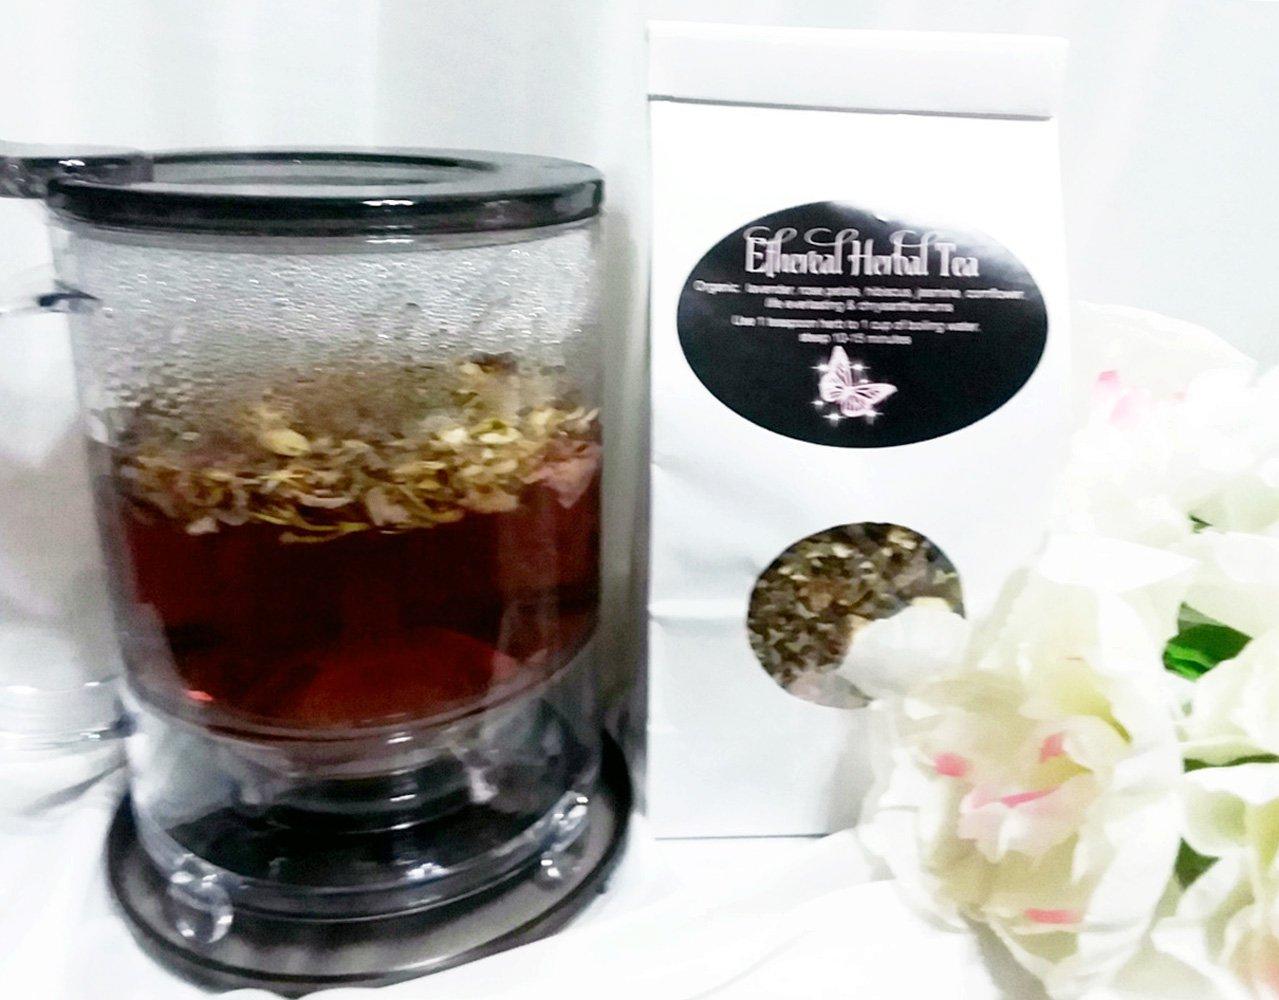 Ethereal Herbal Tea